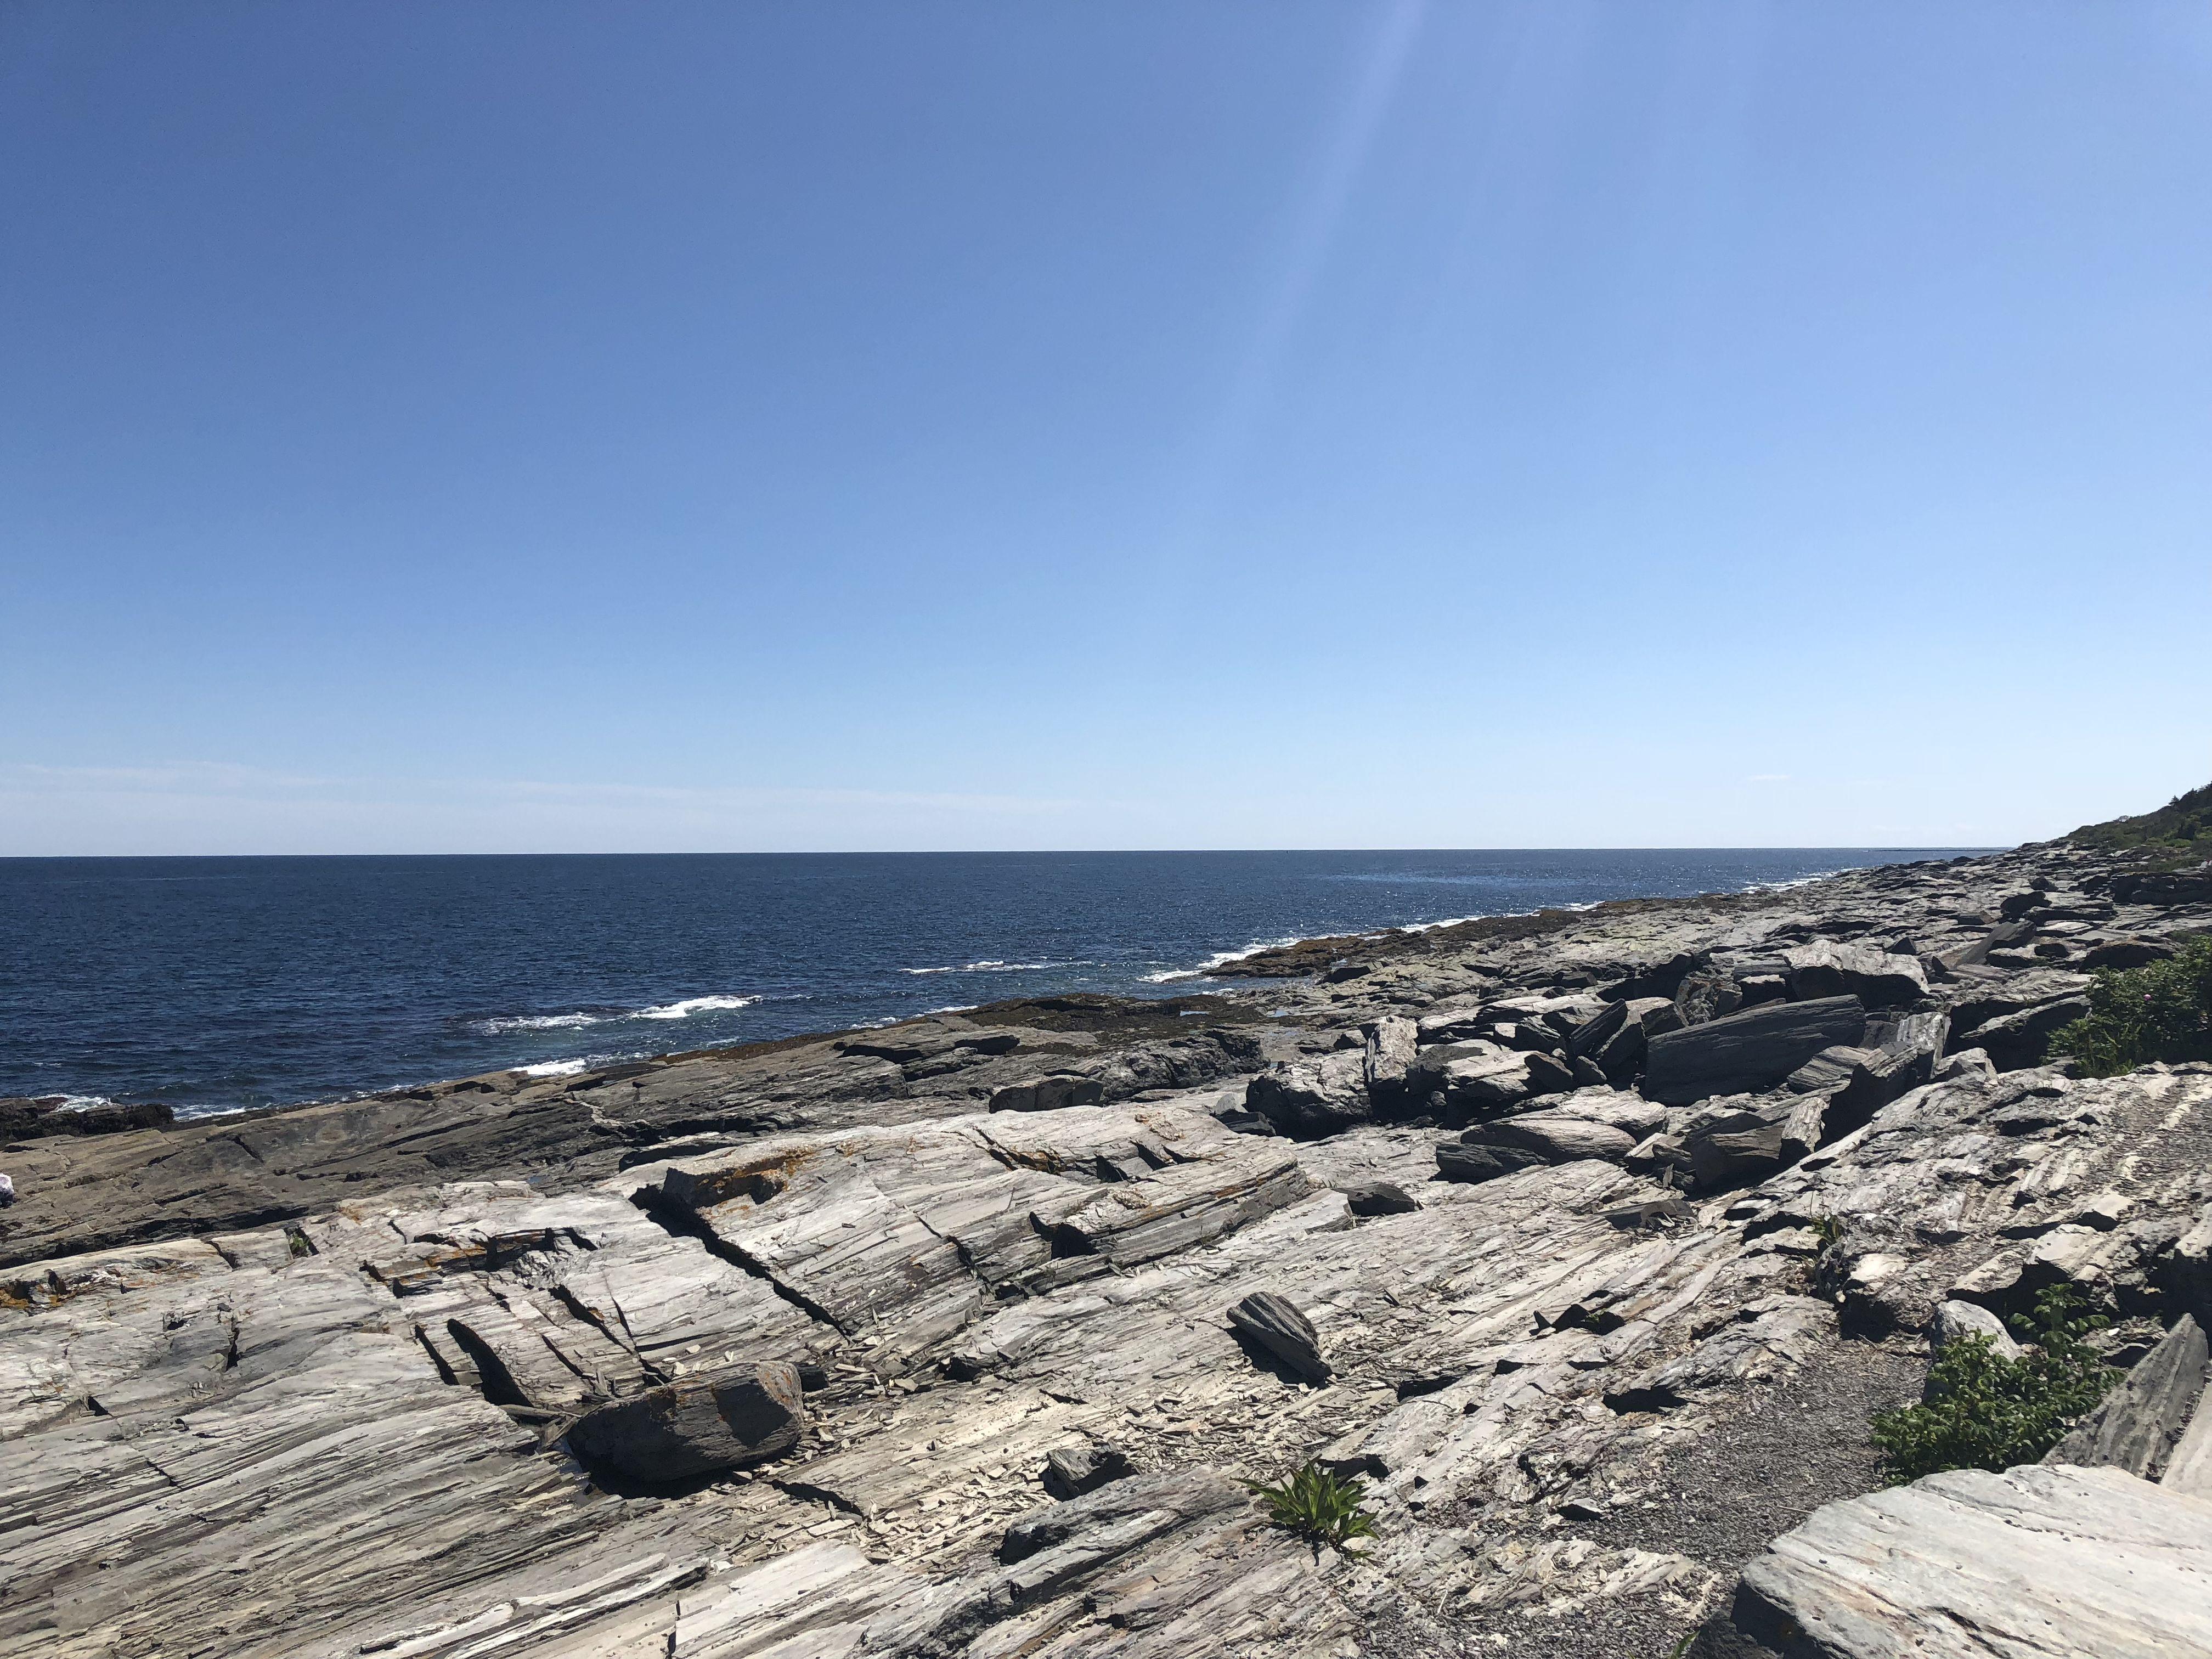 Maine coastline. Rocks at Two Lights State Park